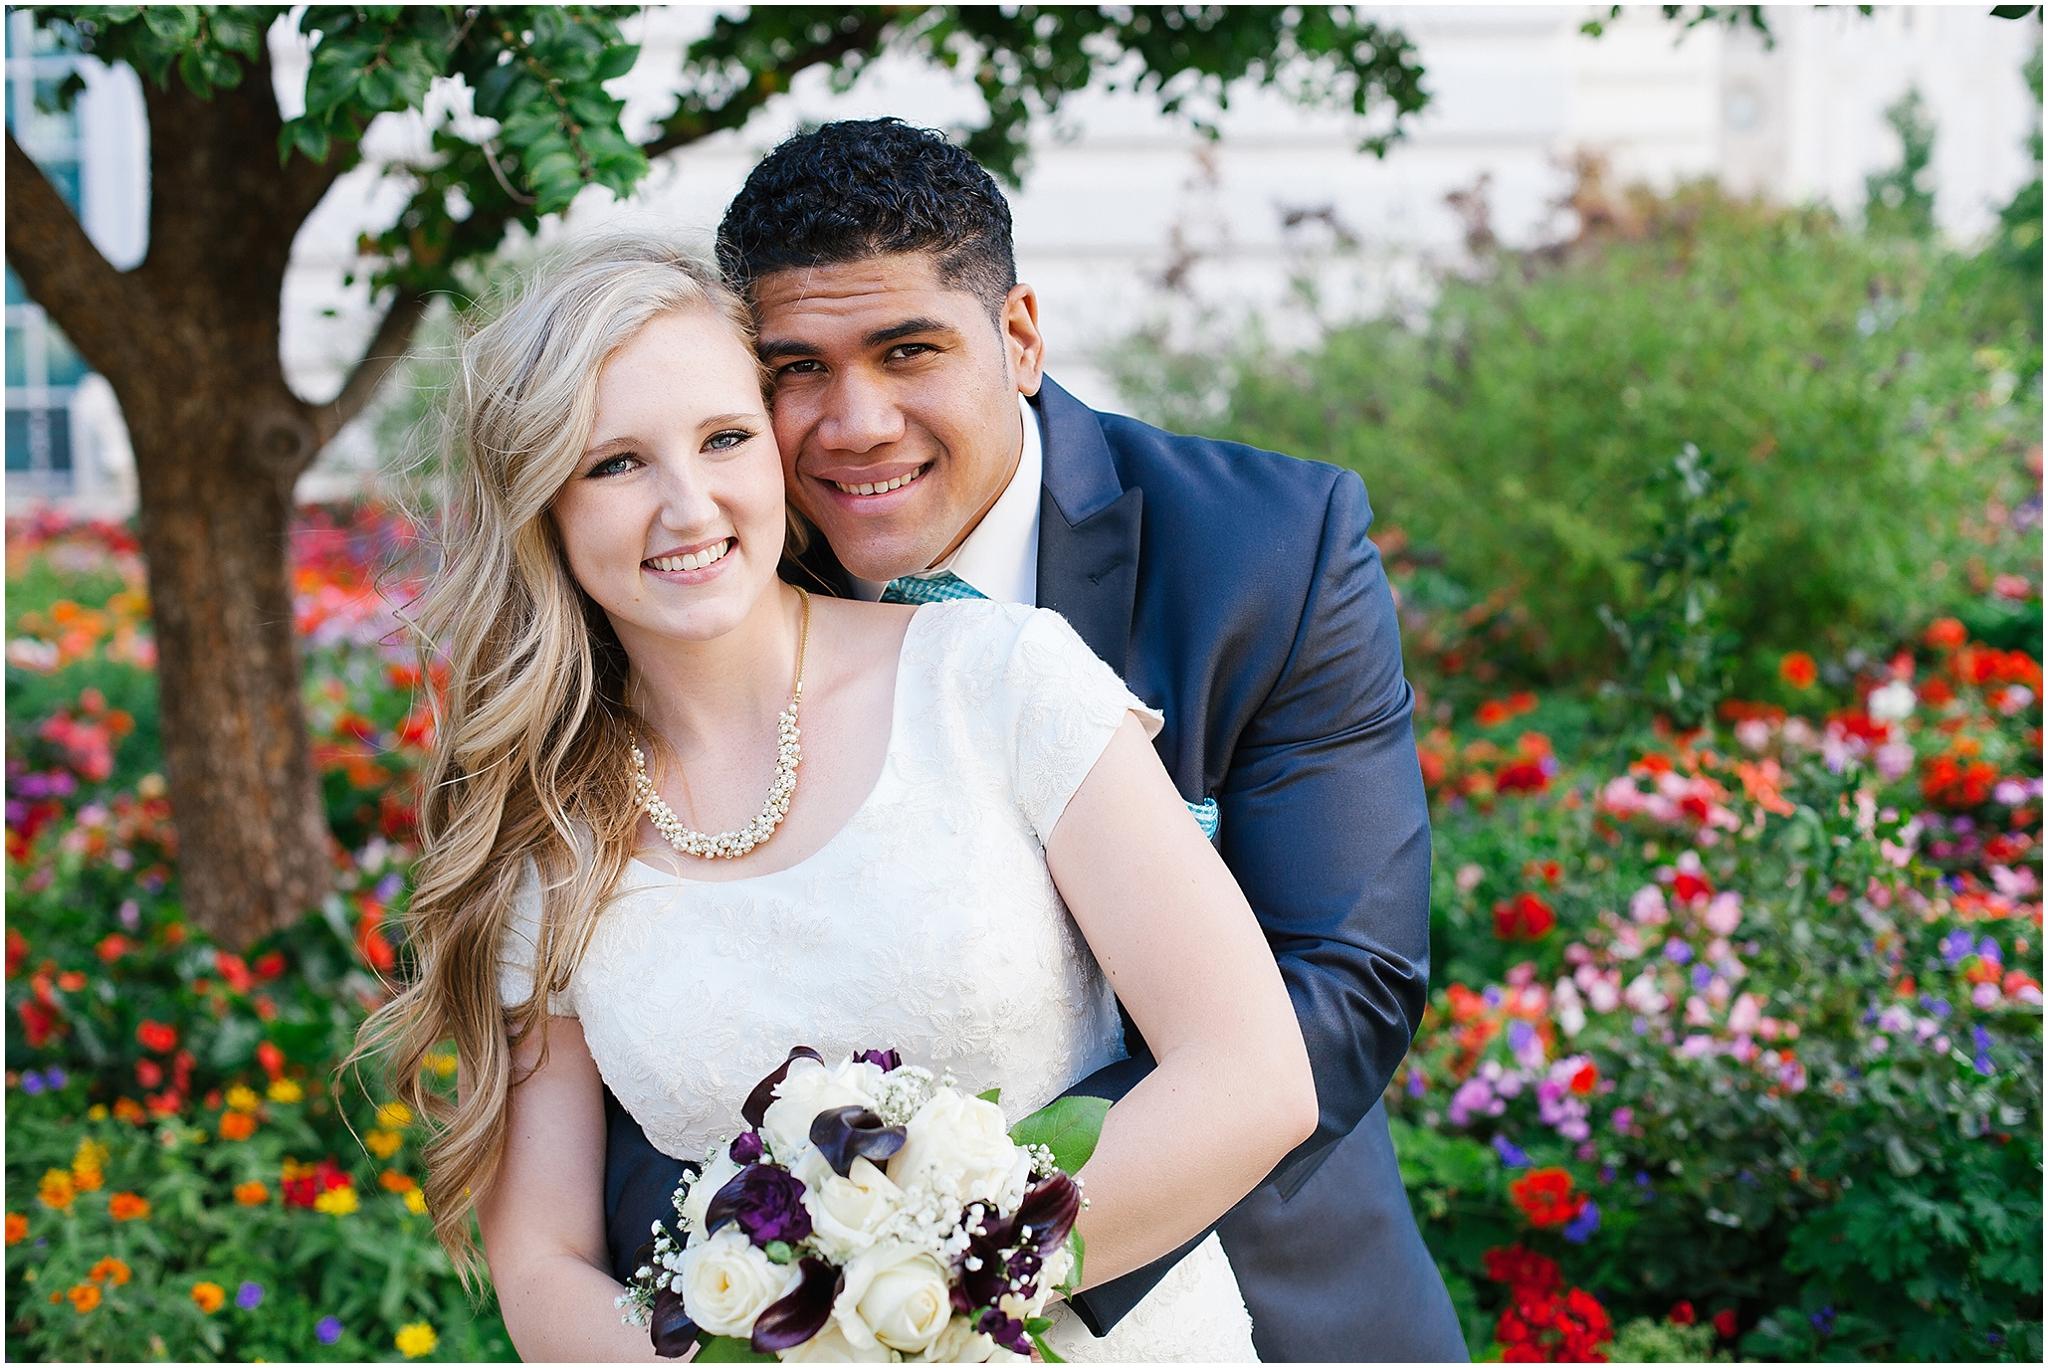 IMG_1516-Edit-52_Lizzie-B-Imagery-Utah-Wedding-Photographer-Salt-Lake-City-Park-City-timpanogos-Utah-Temple.jpg